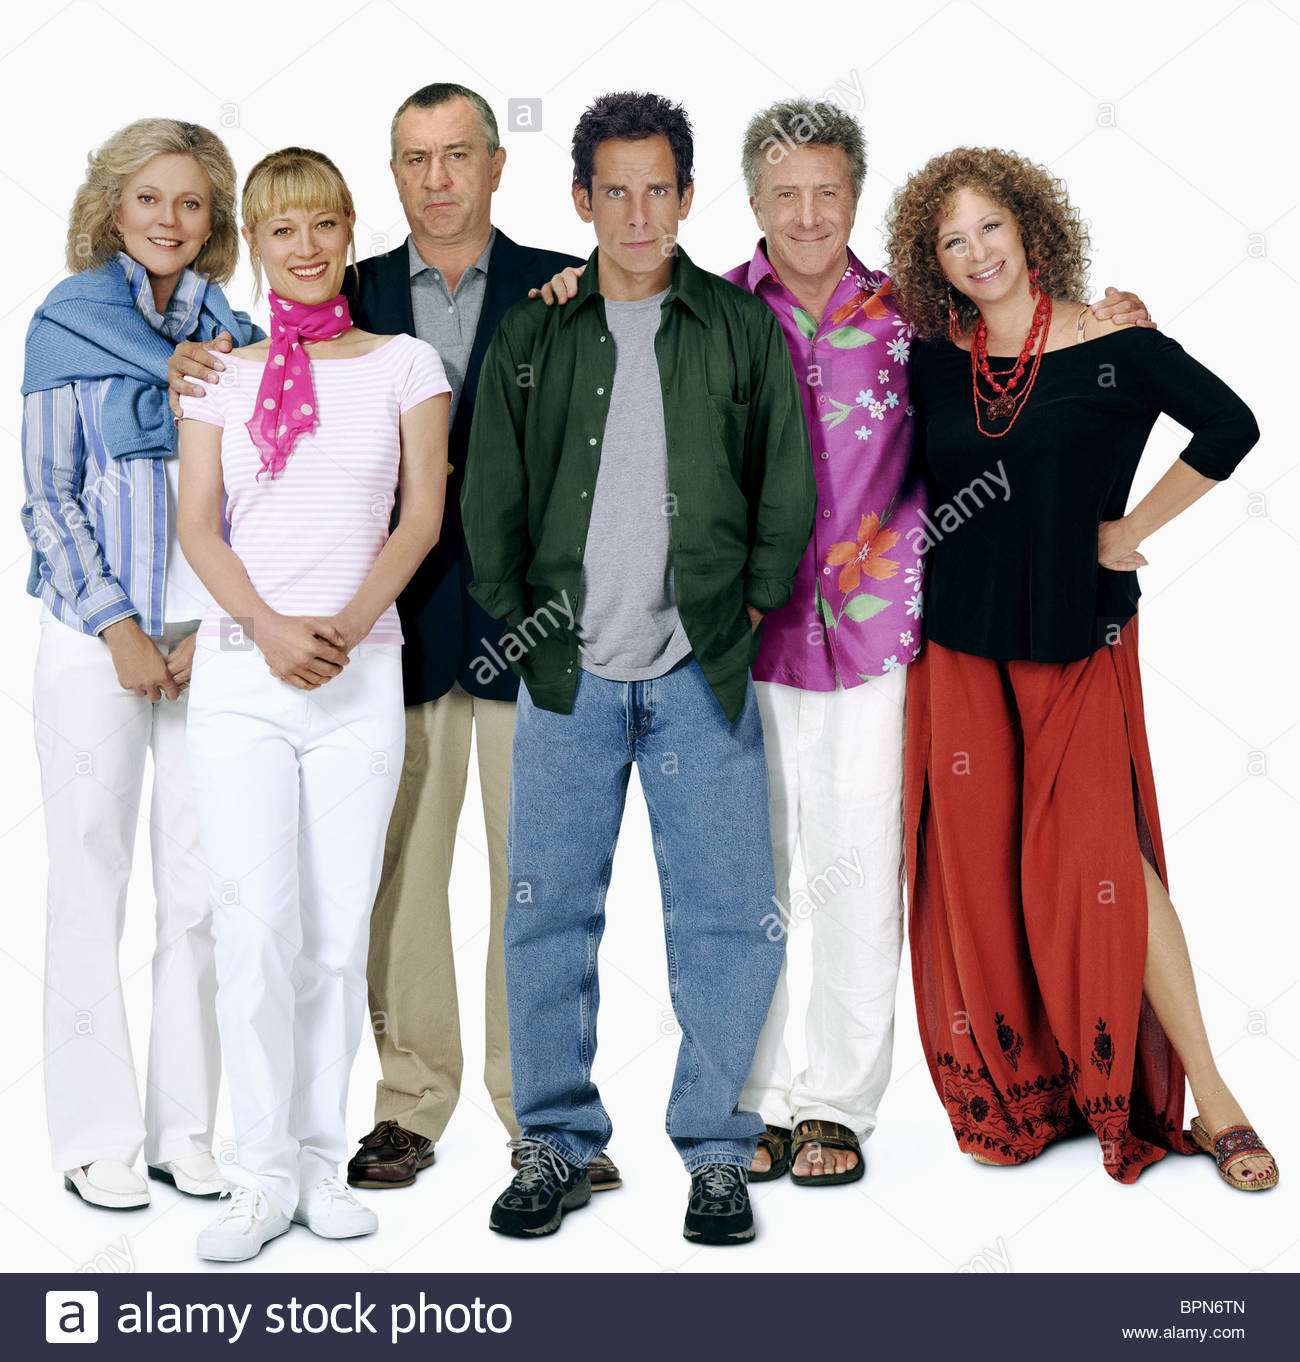 BLYTHE DANNER TERI POLO Robert De Niro Ben Stiller Dustin Hoffman e Barbra Streisand soddisfano i FOCKERS (2004) Immagini Stock